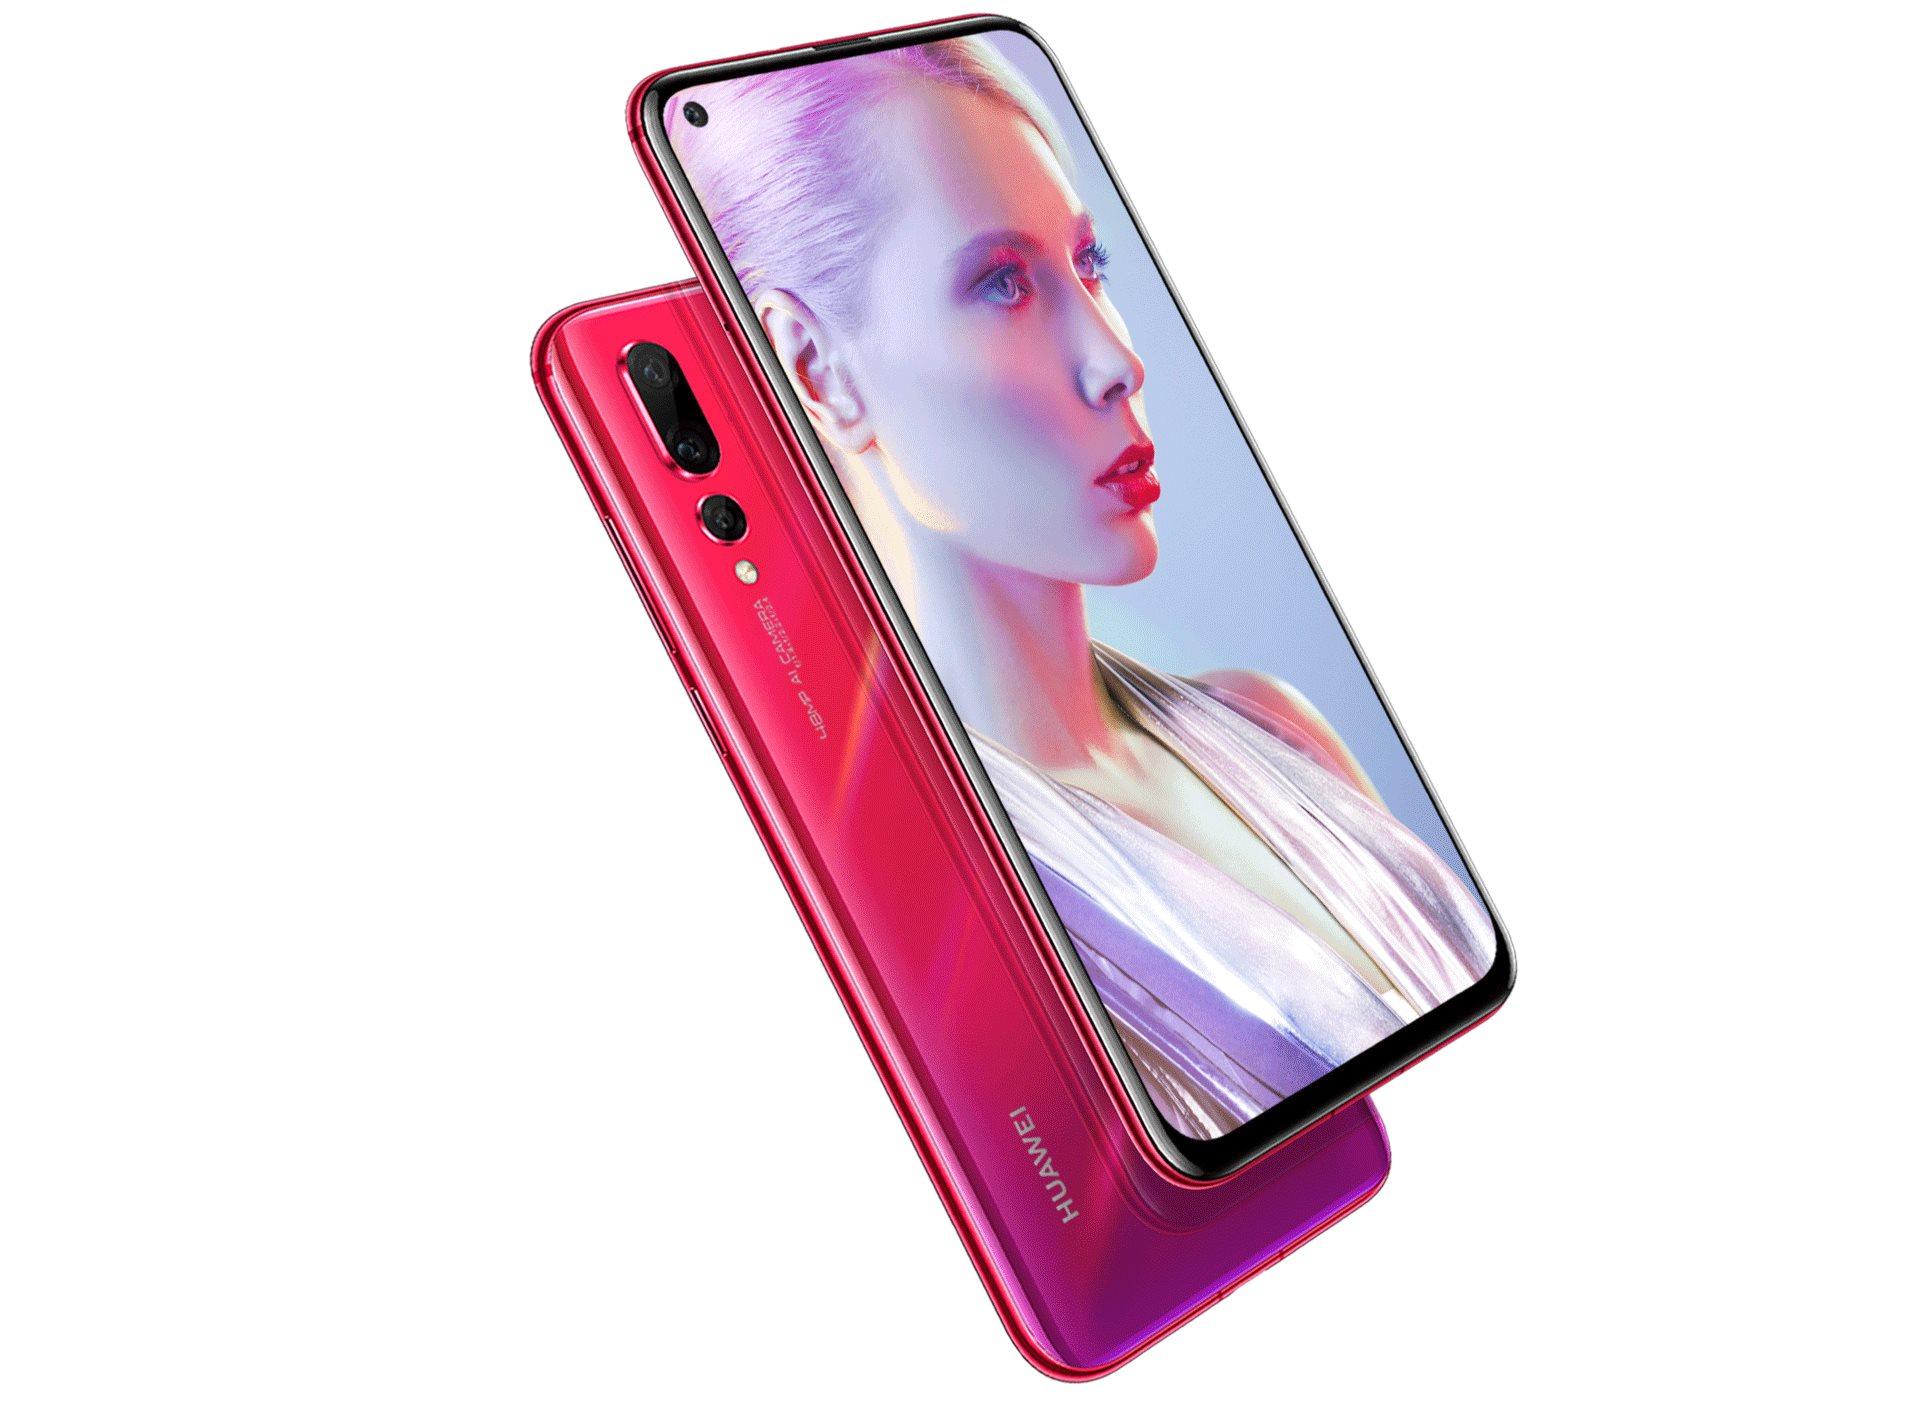 Huawei Nova 4 Officialise Images Caracteristiques